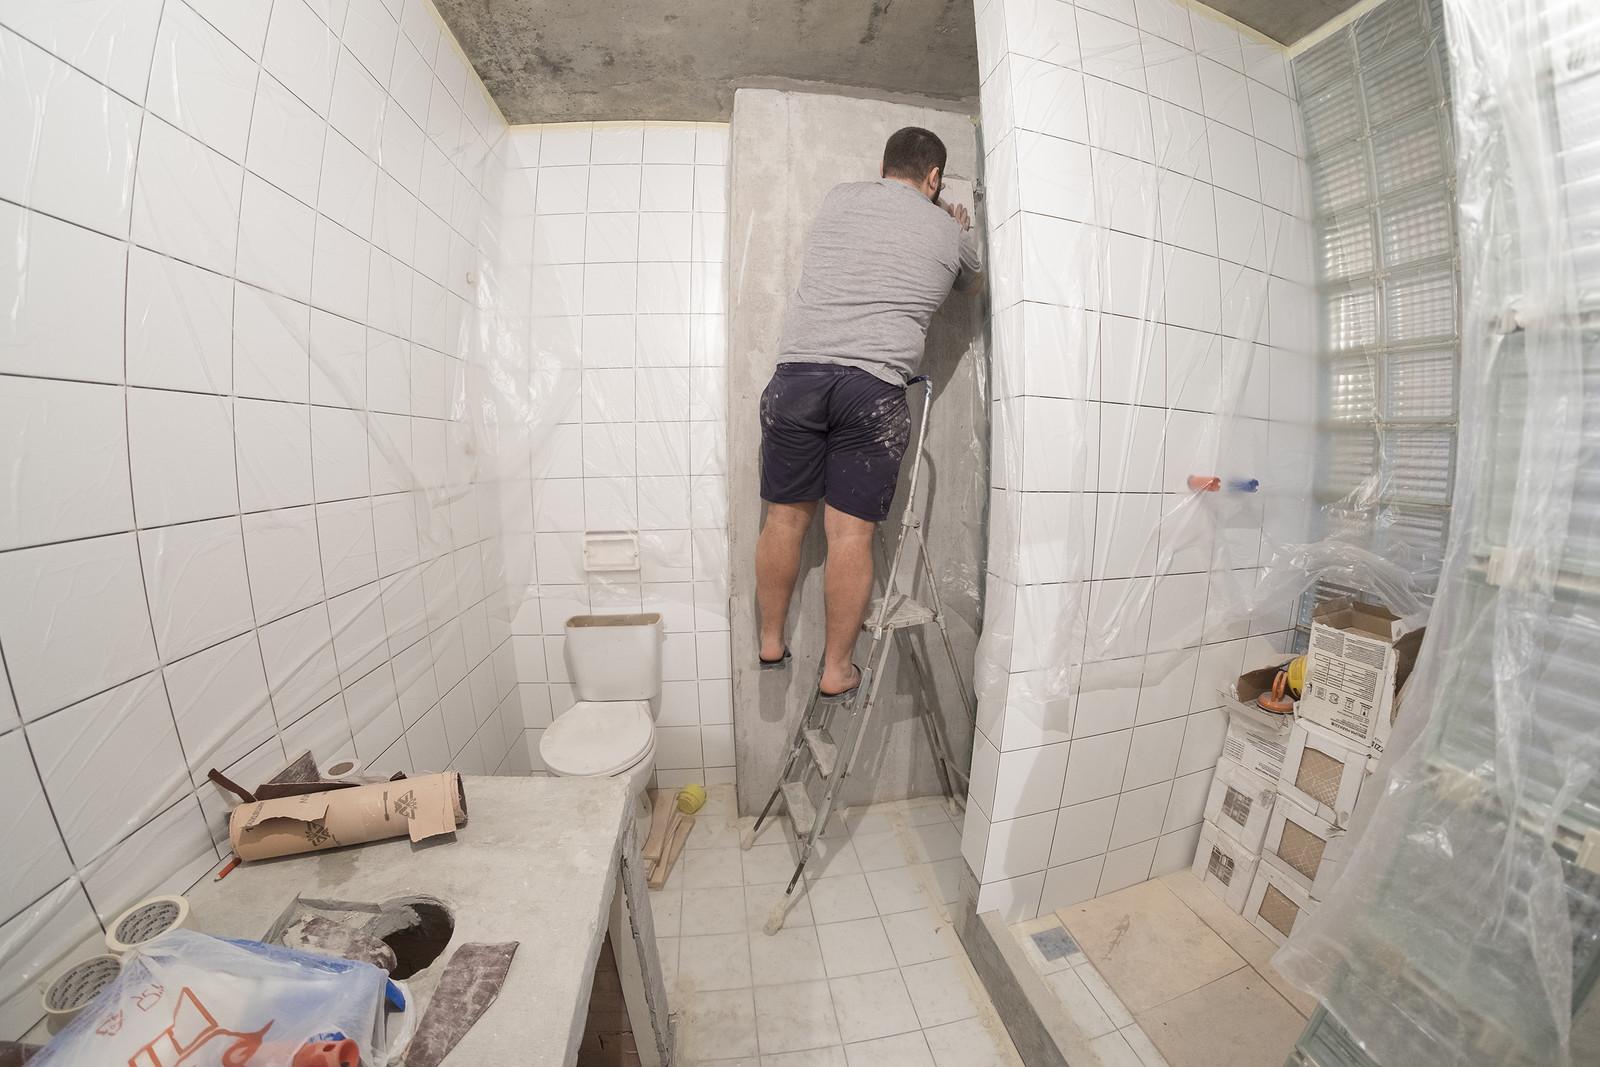 косяки ремонта квартиры фото спрашиваем сколько